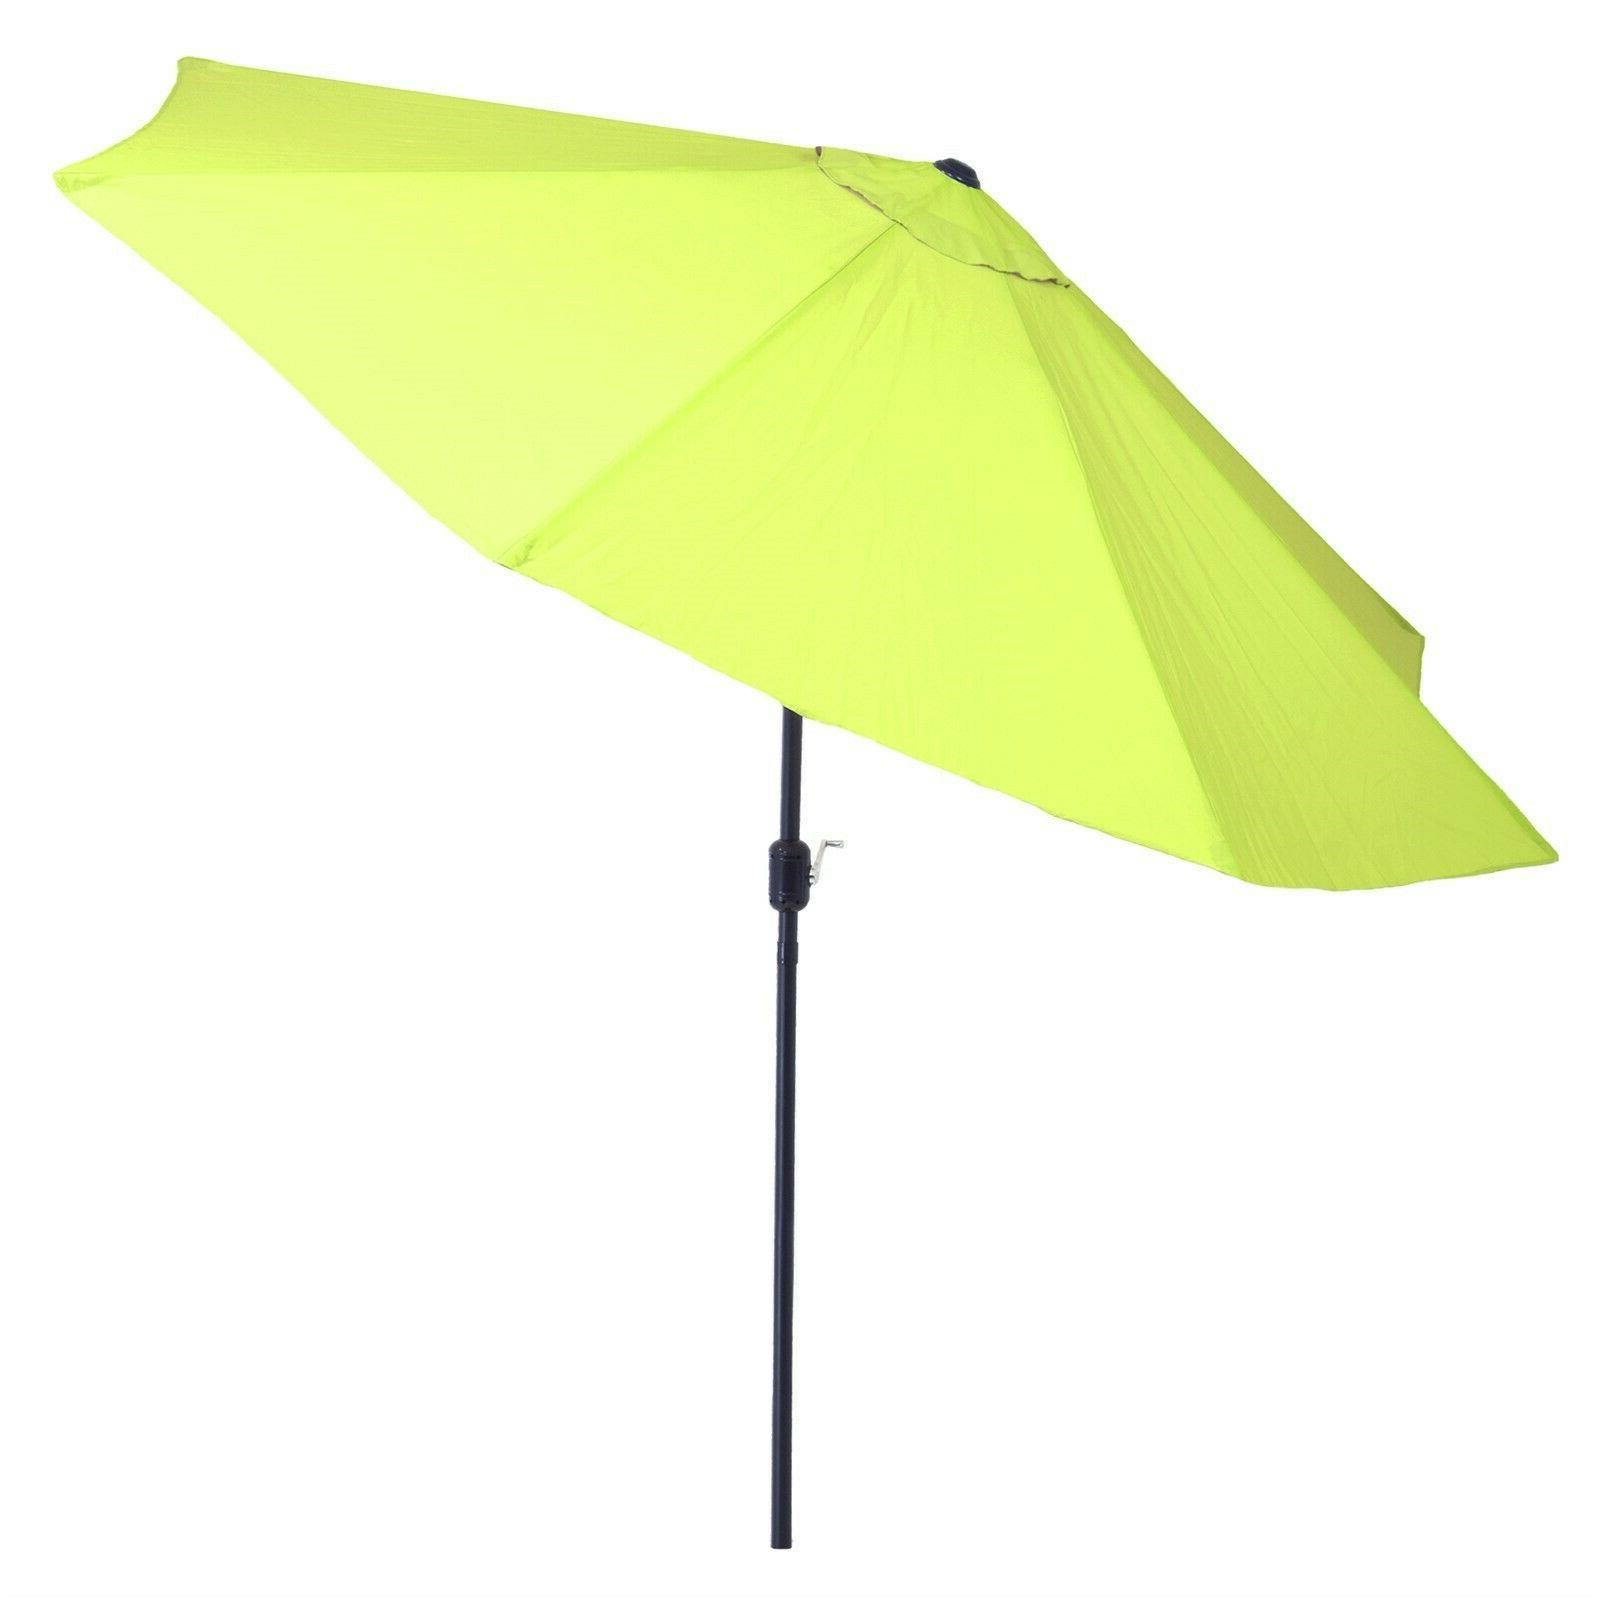 10 Feet Aluminum Pole Umbrella with Auto Tilt Crank Lime Gre